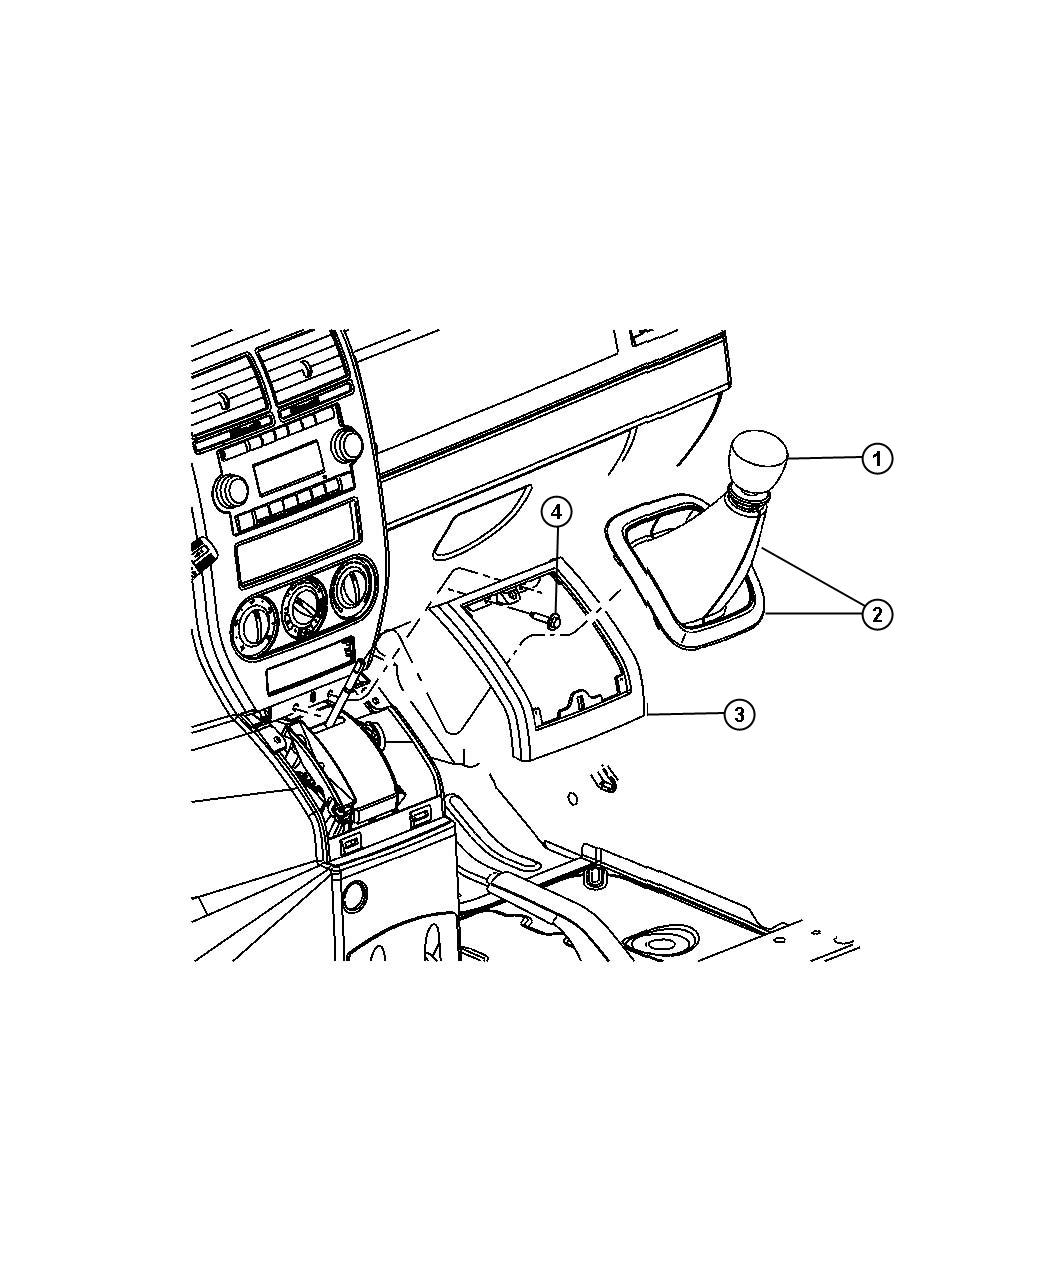 Jeep Patriot Knob. Gearshift. [6-speed manual aisin bg6